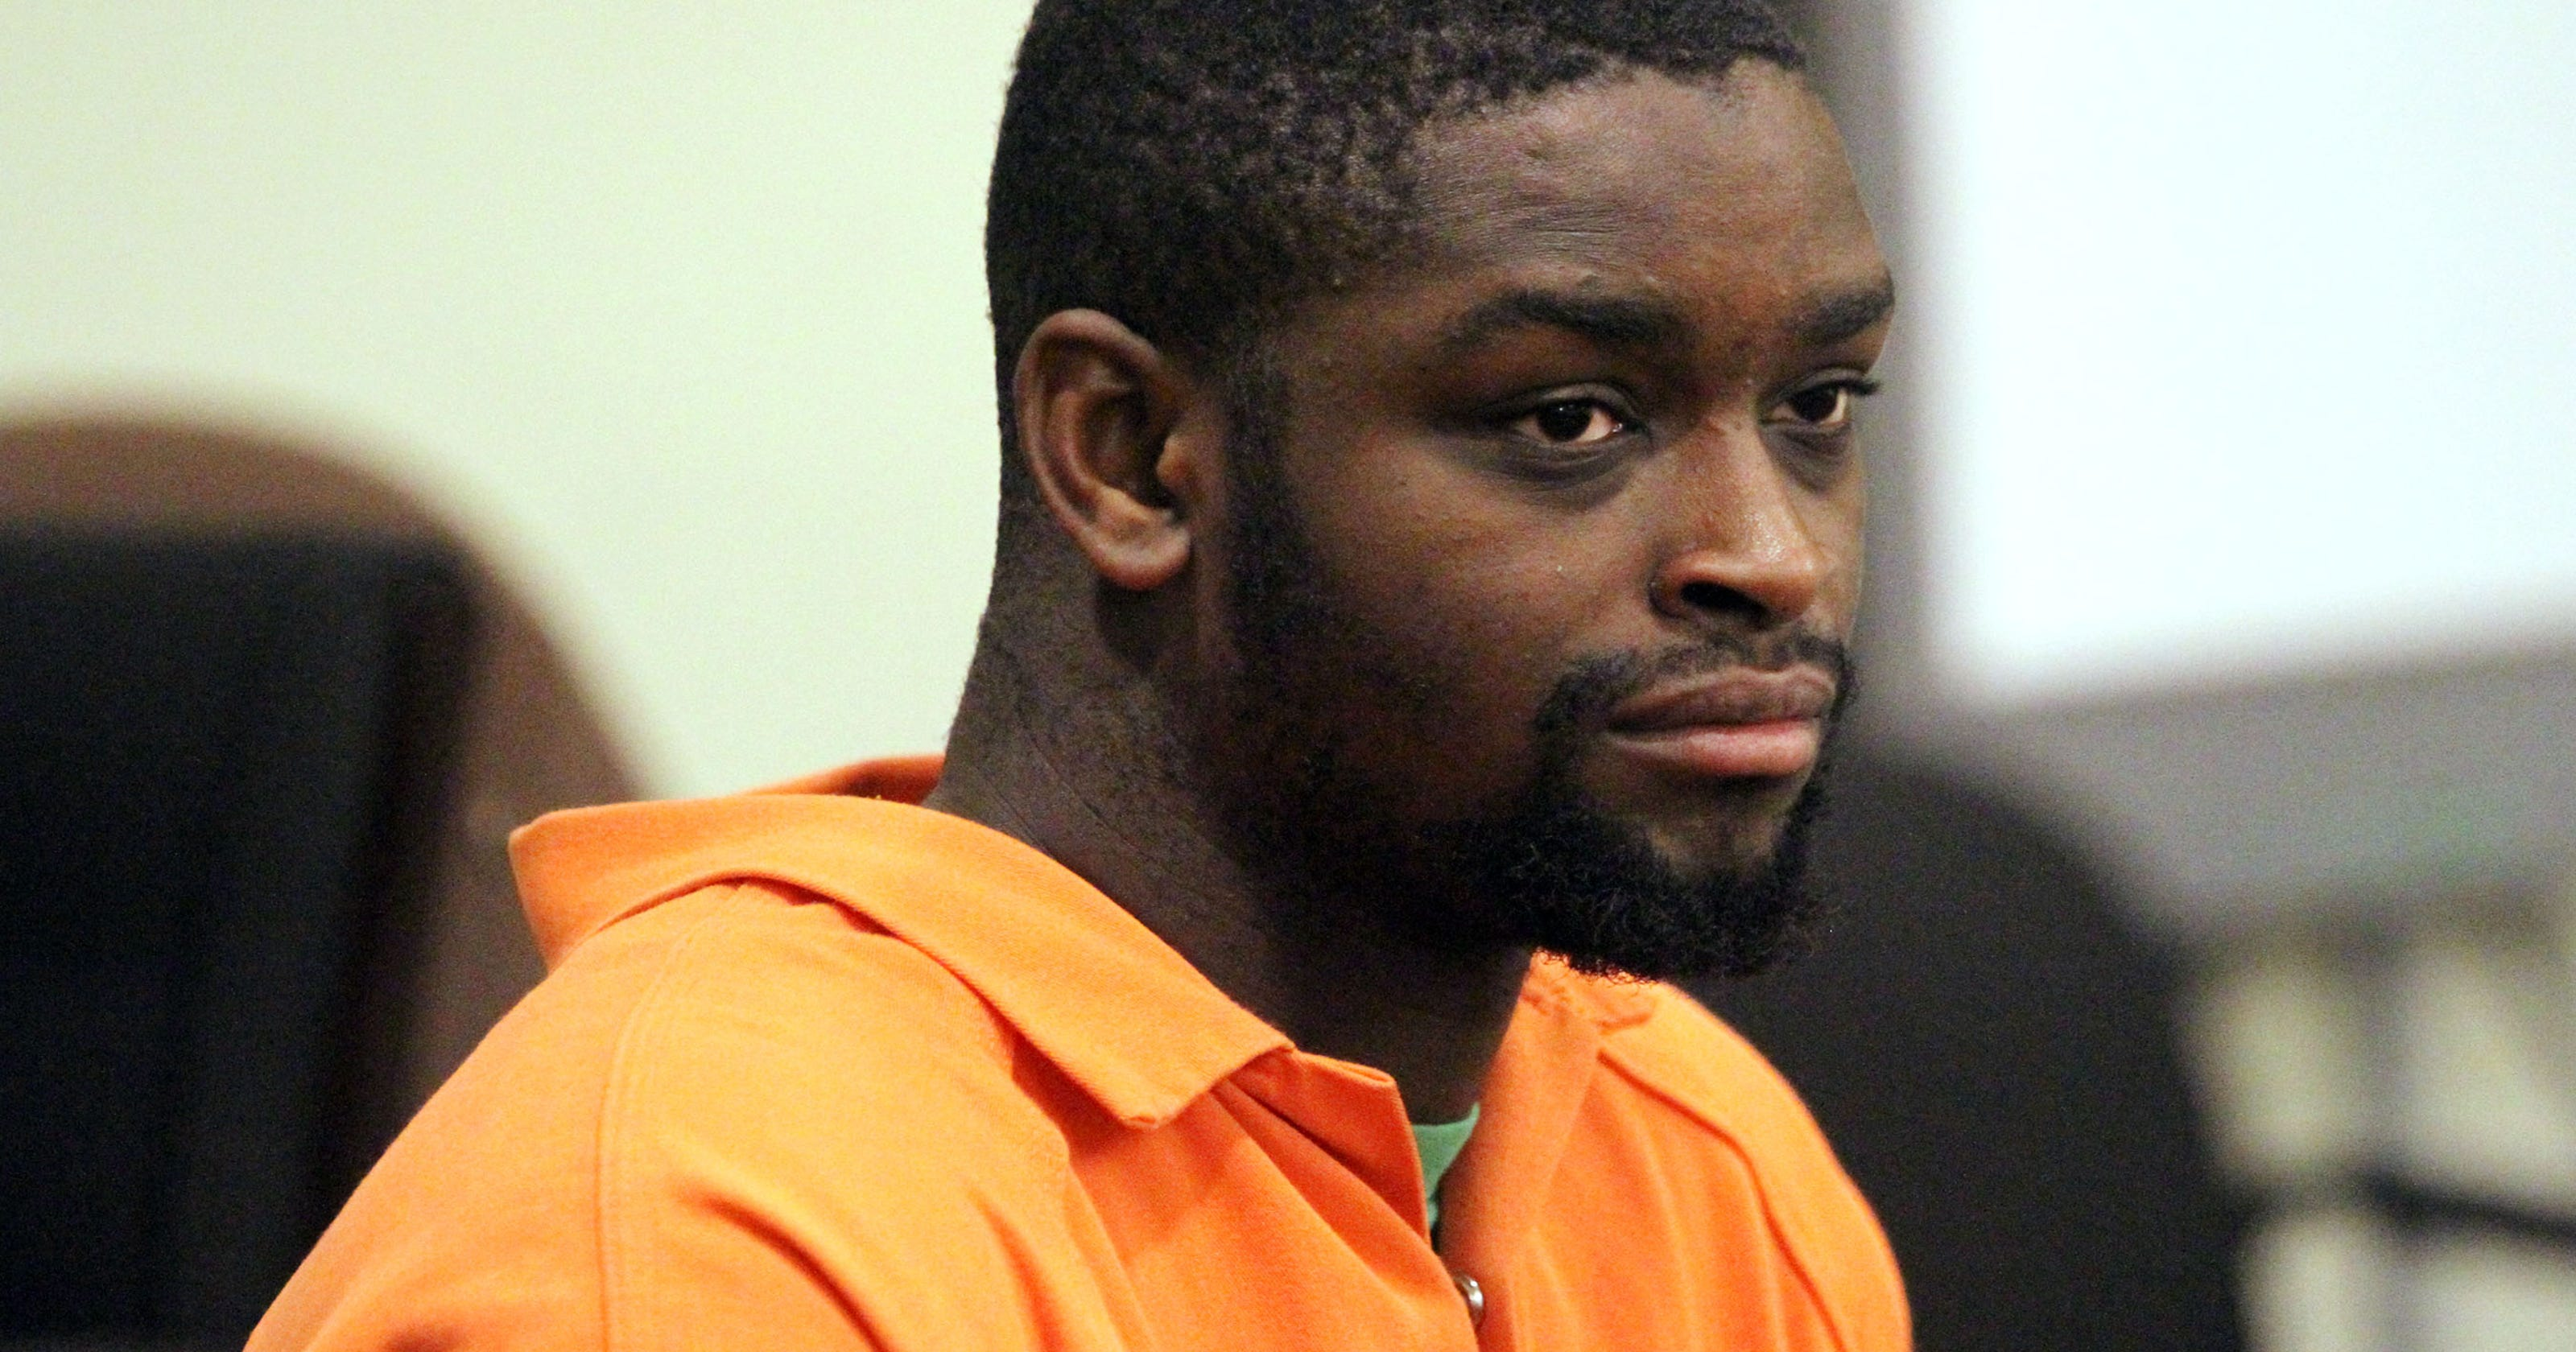 8 former Rutgers football players arraigned